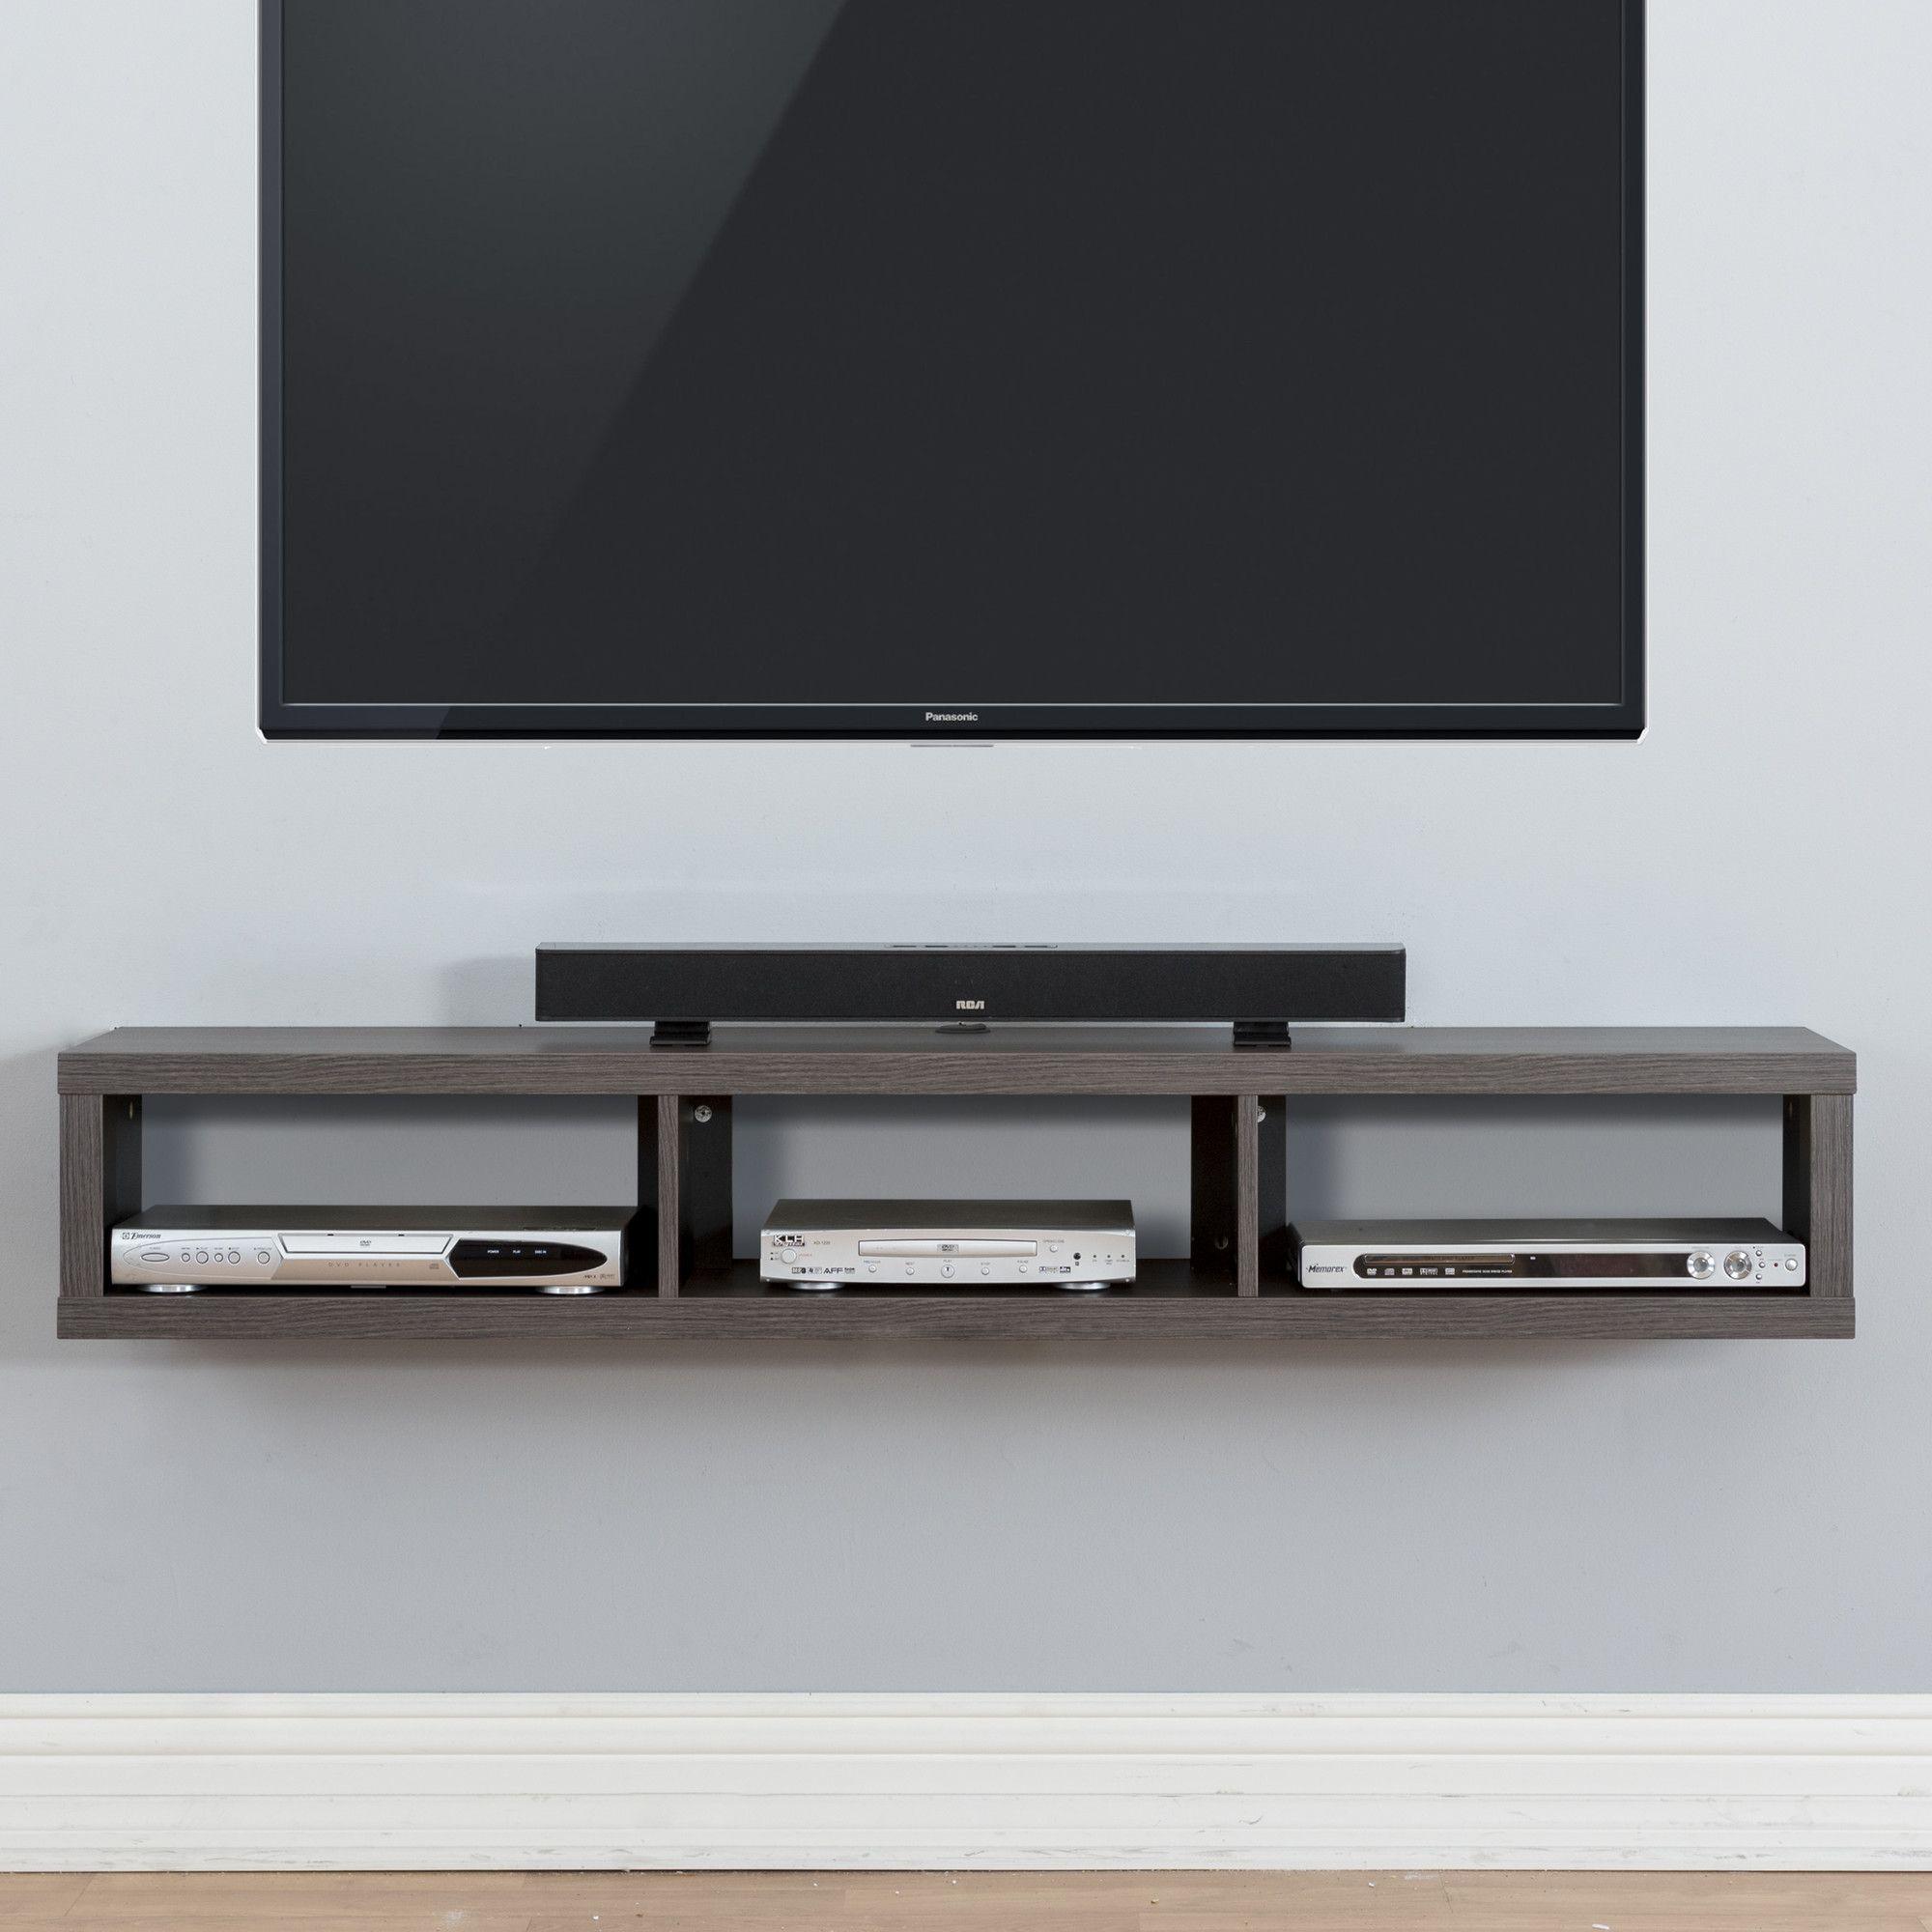 60 Shallow Wall Mounted Tv Component Shelf Wall Mount Tv Shelf